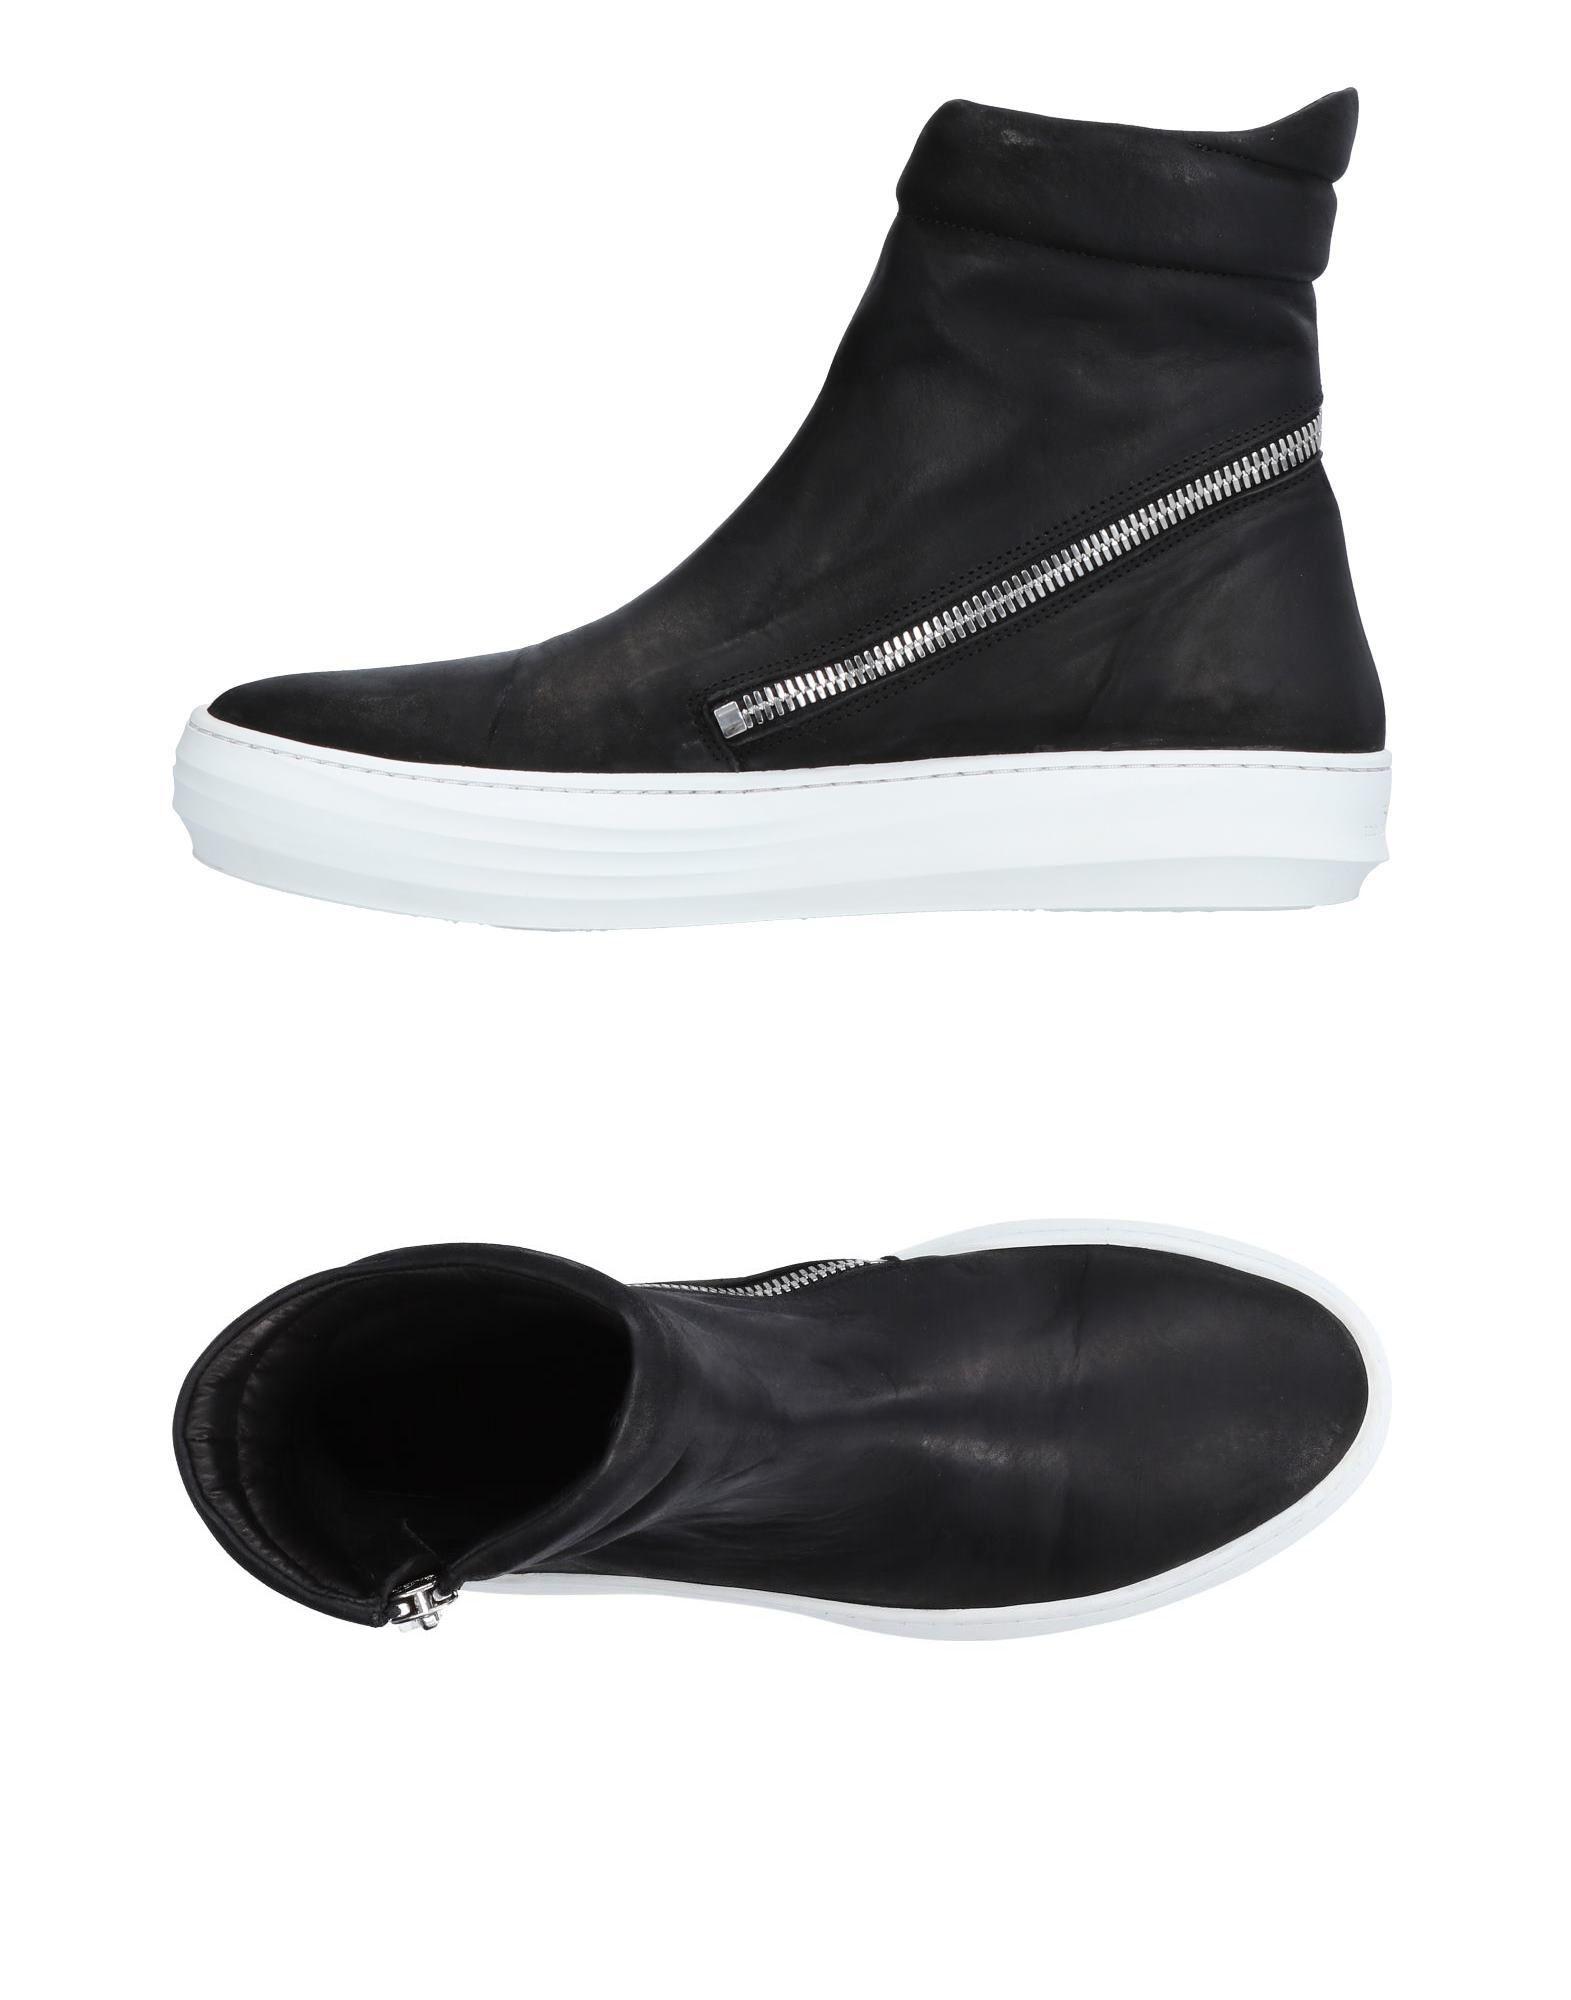 Sneakers The Last Conspiracy Uomo - 11518132JI